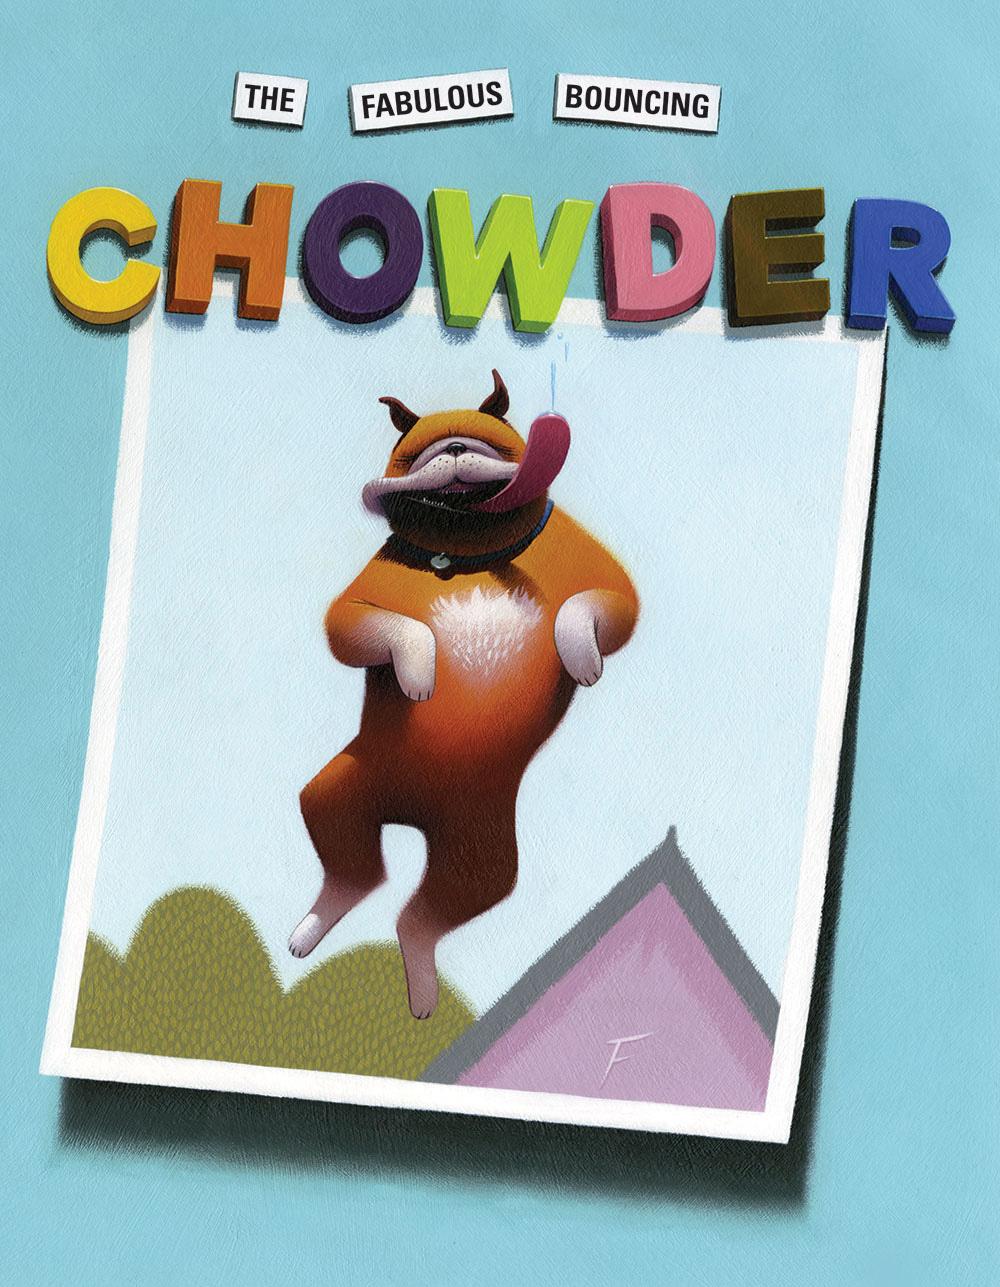 Brown, Peter 2007_09 - THE FABULOUS BOUNCING CHOWDER - PB - RLM PR.jpg